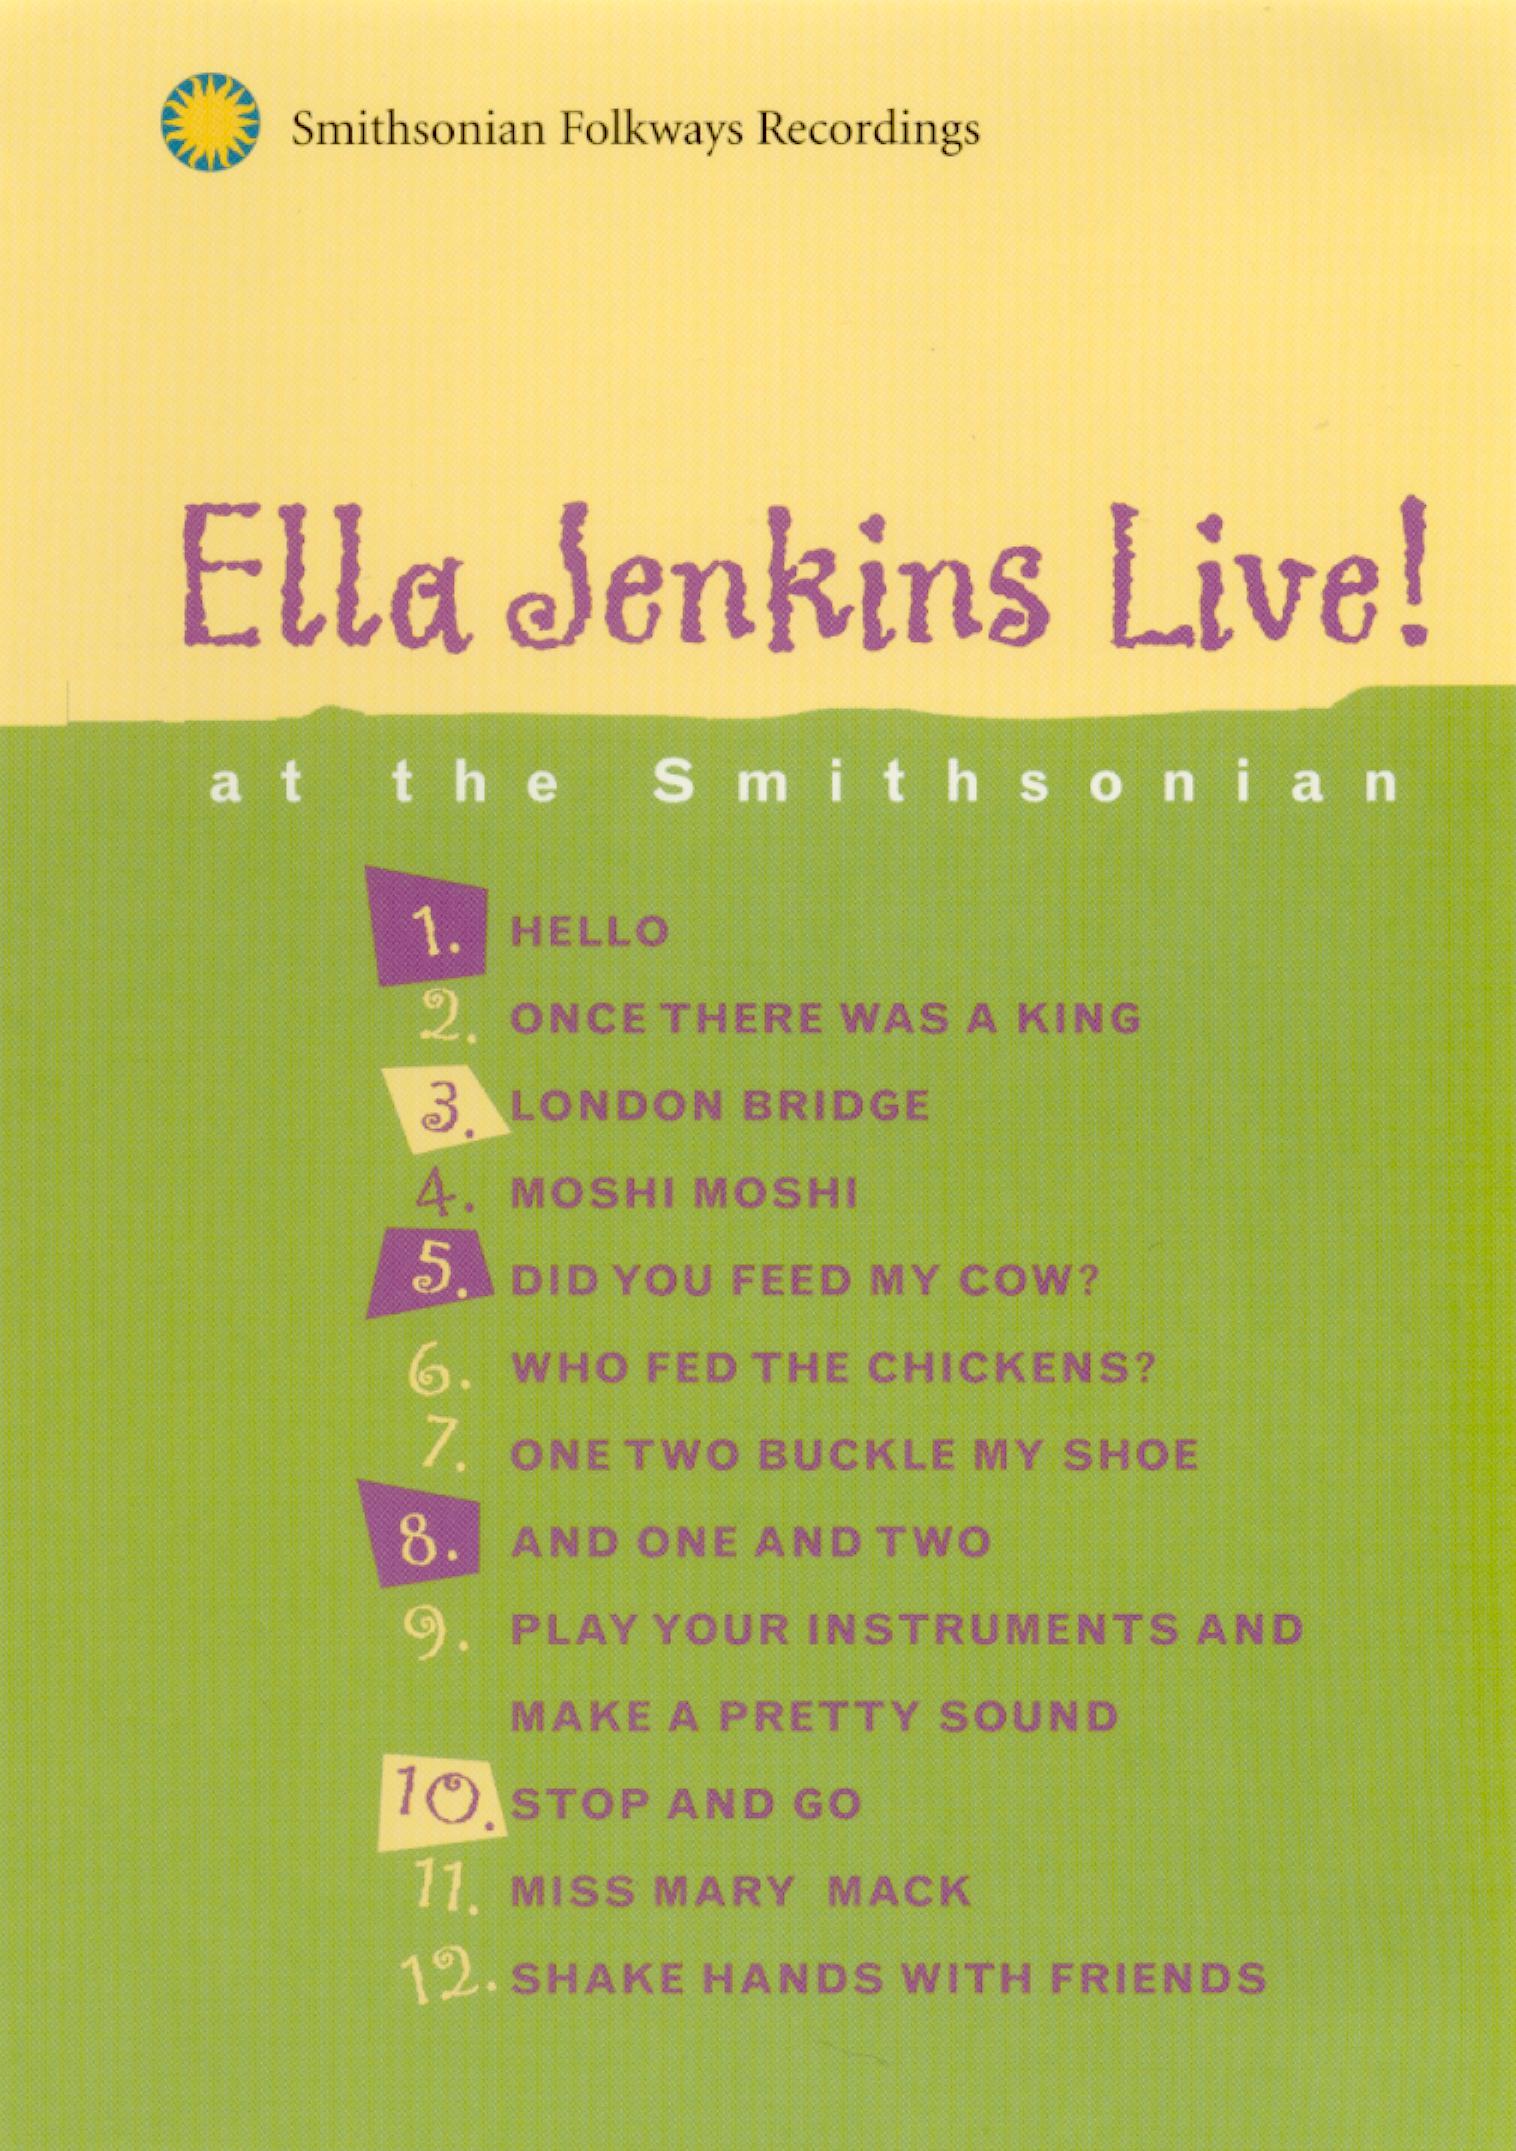 Ella Jenkins Live! at the Smithsonian